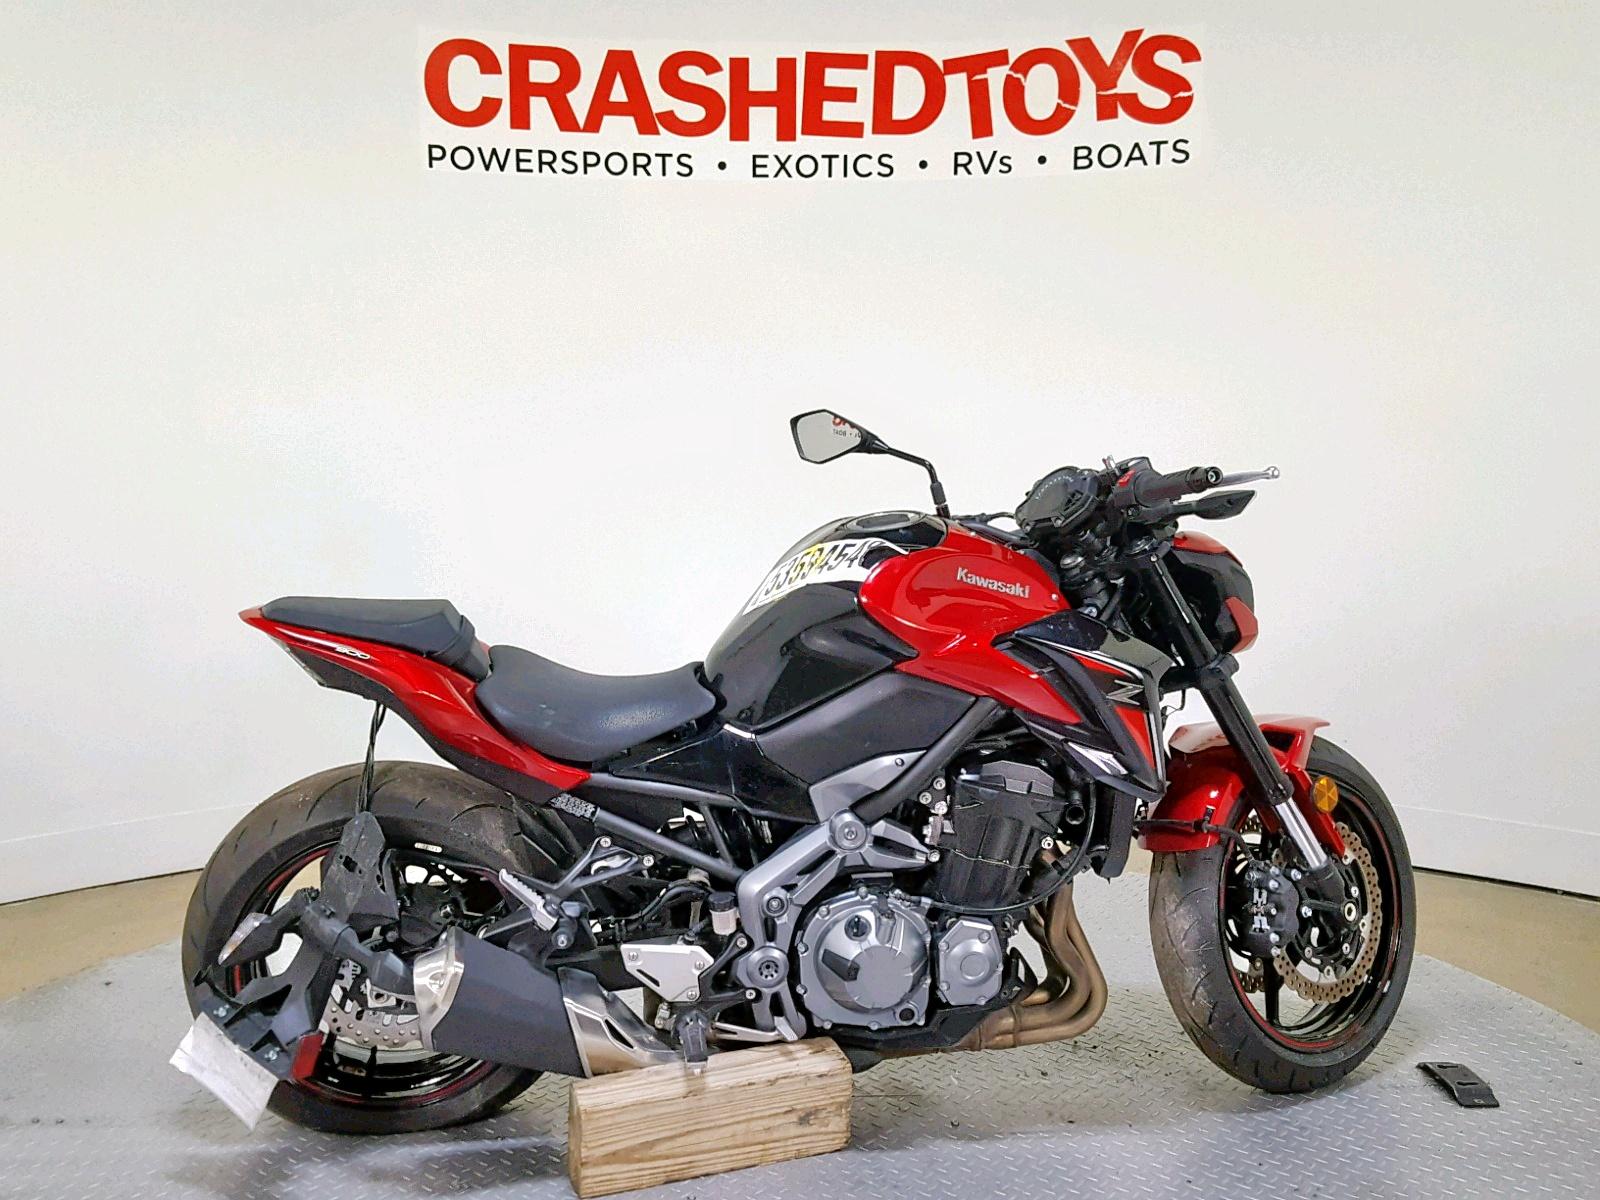 Salvage 2018 Kawasaki ZR900 for sale